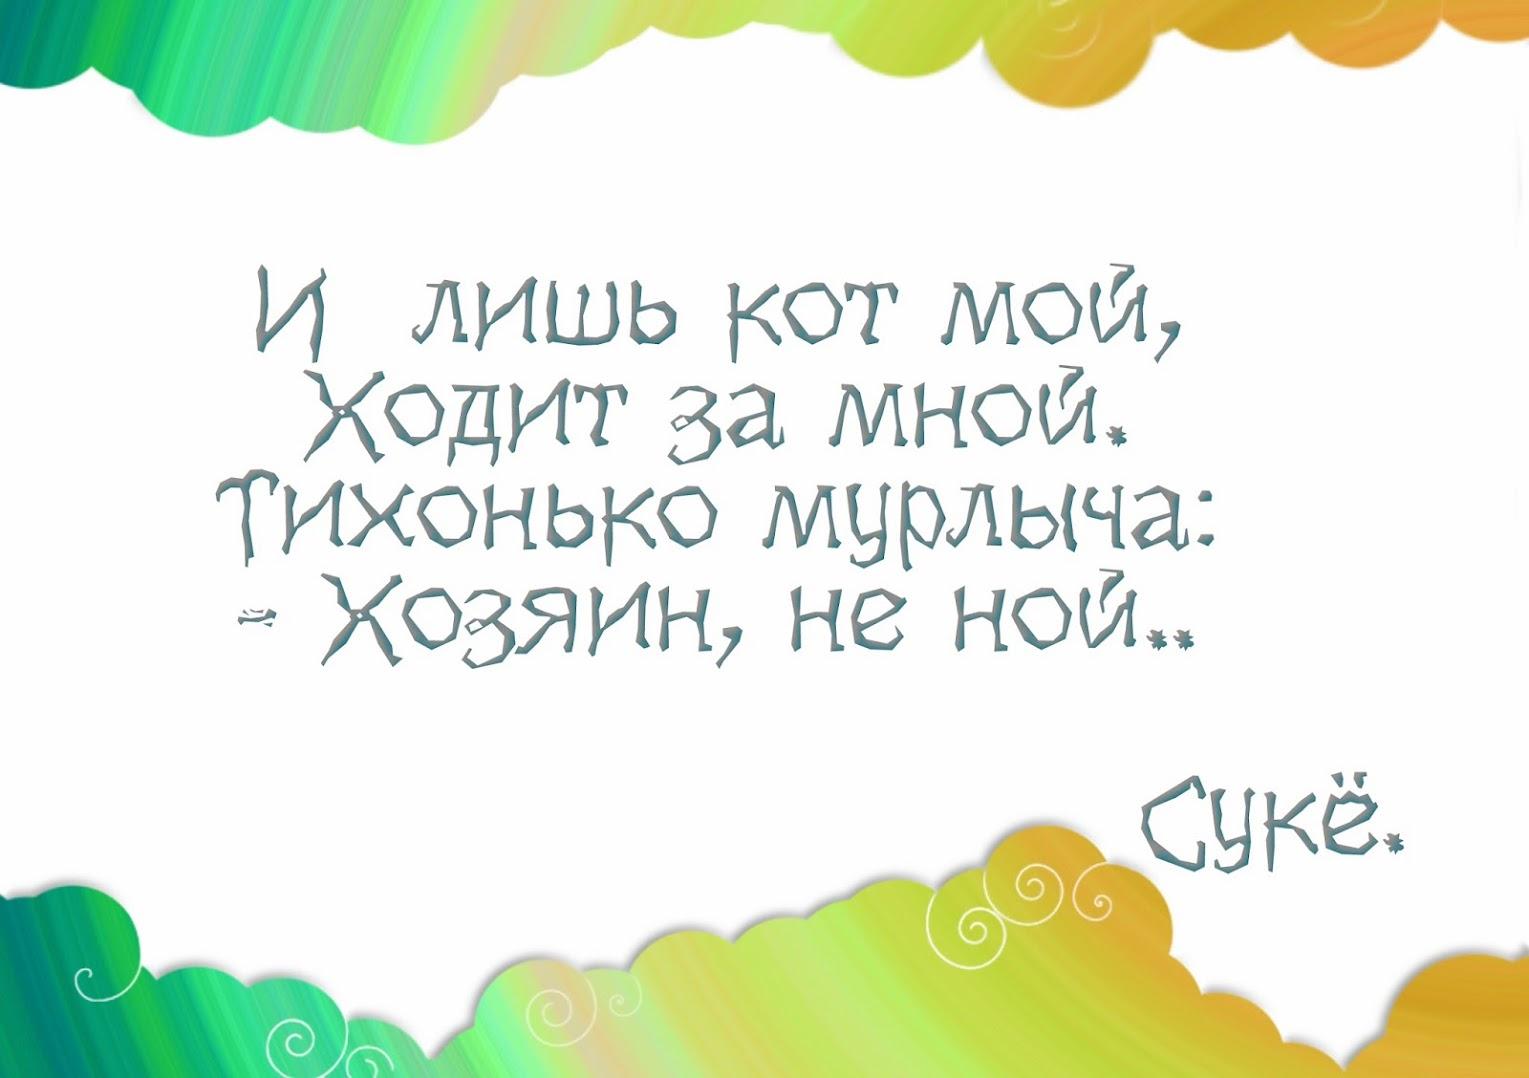 Сафинука-НедоХоку #19